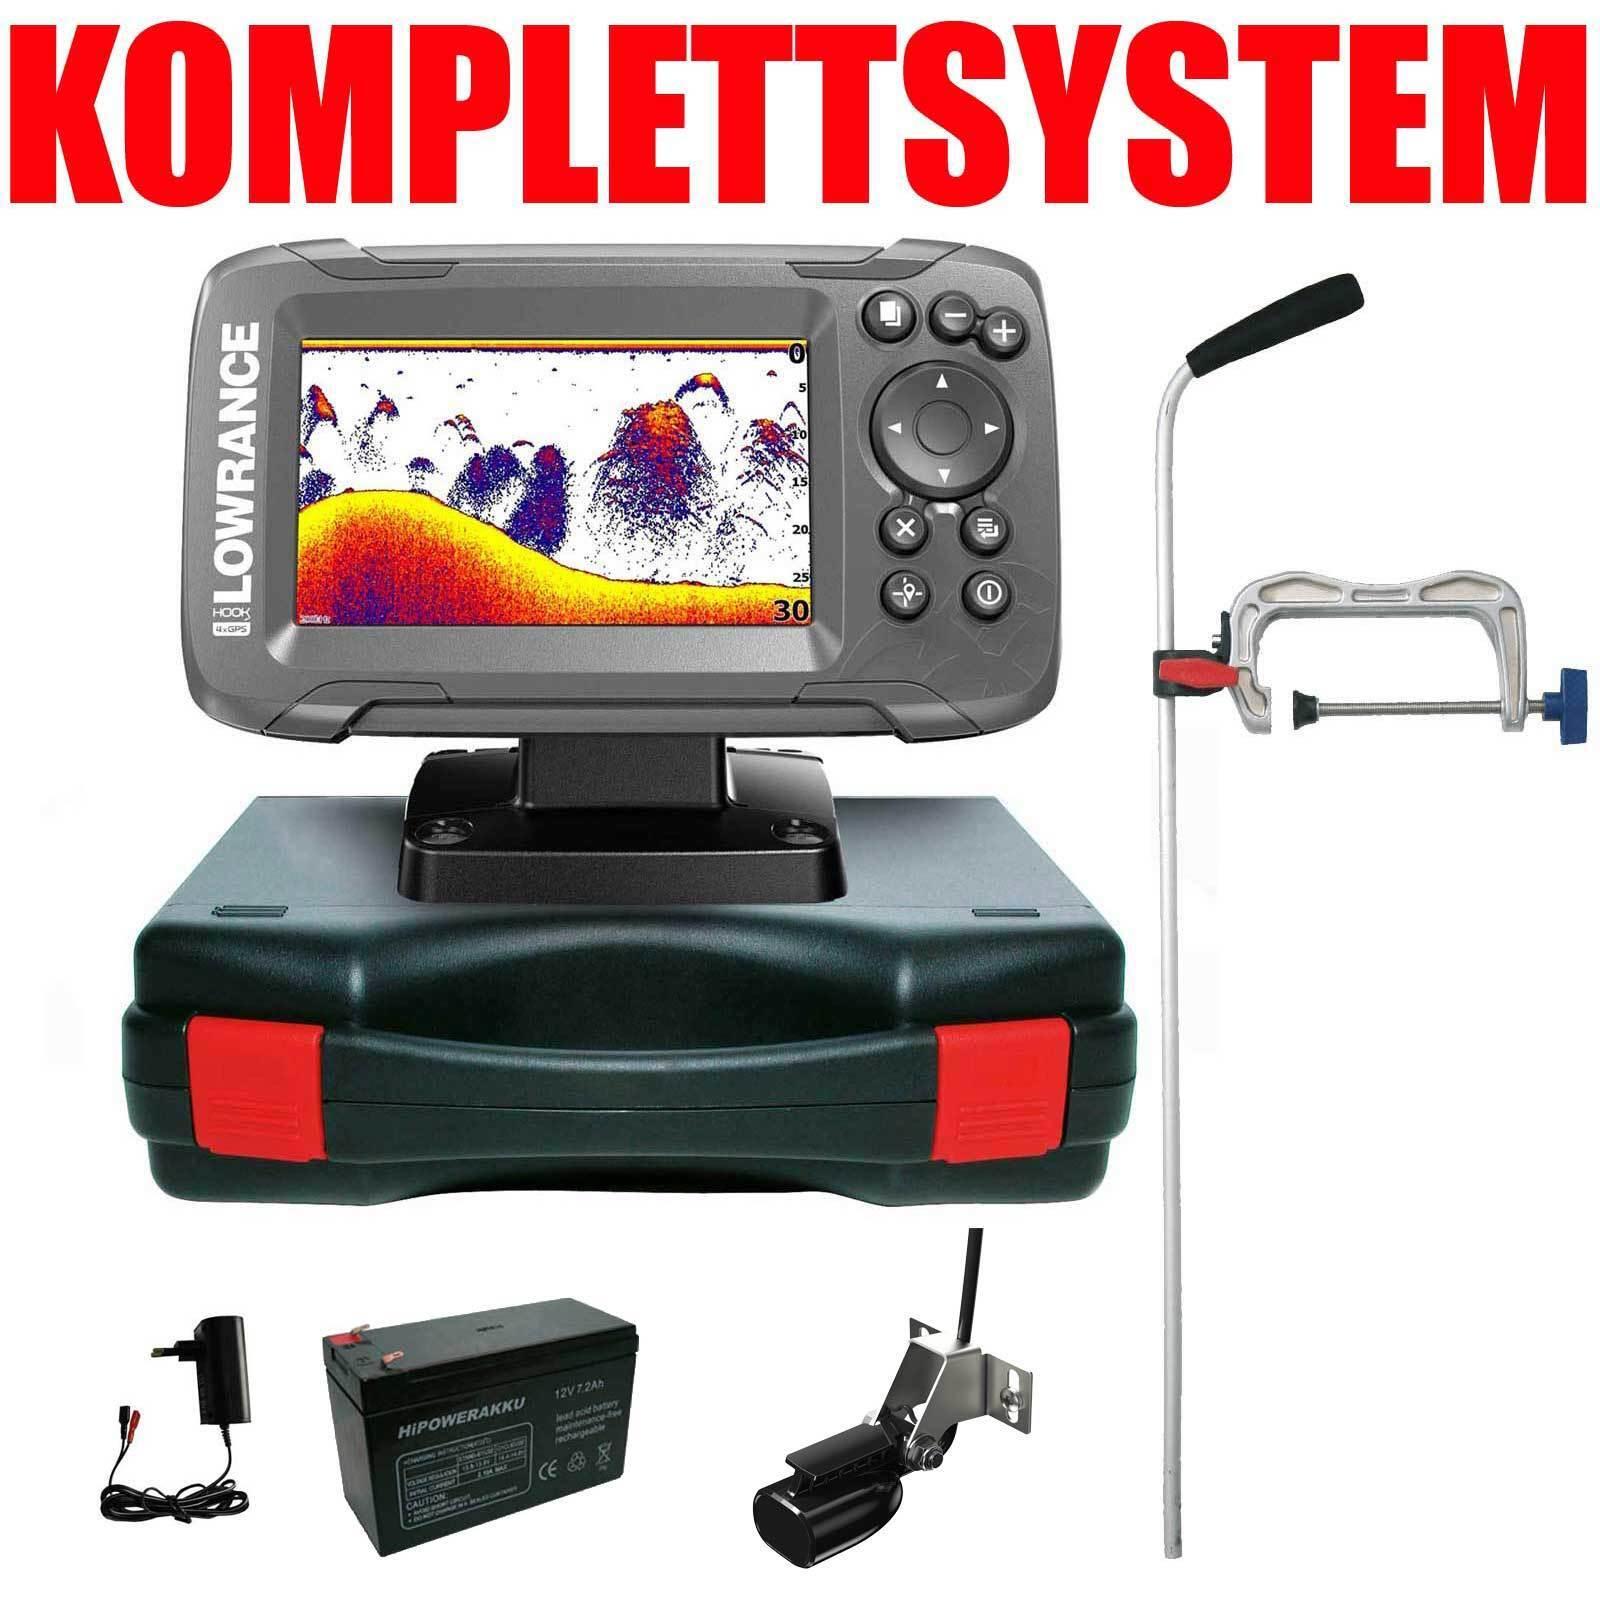 Niedrigrance Echolot GPS Portabel Profi Edition Komplettsystem - Hook2 4x 4x 4x GPS 33ad4e